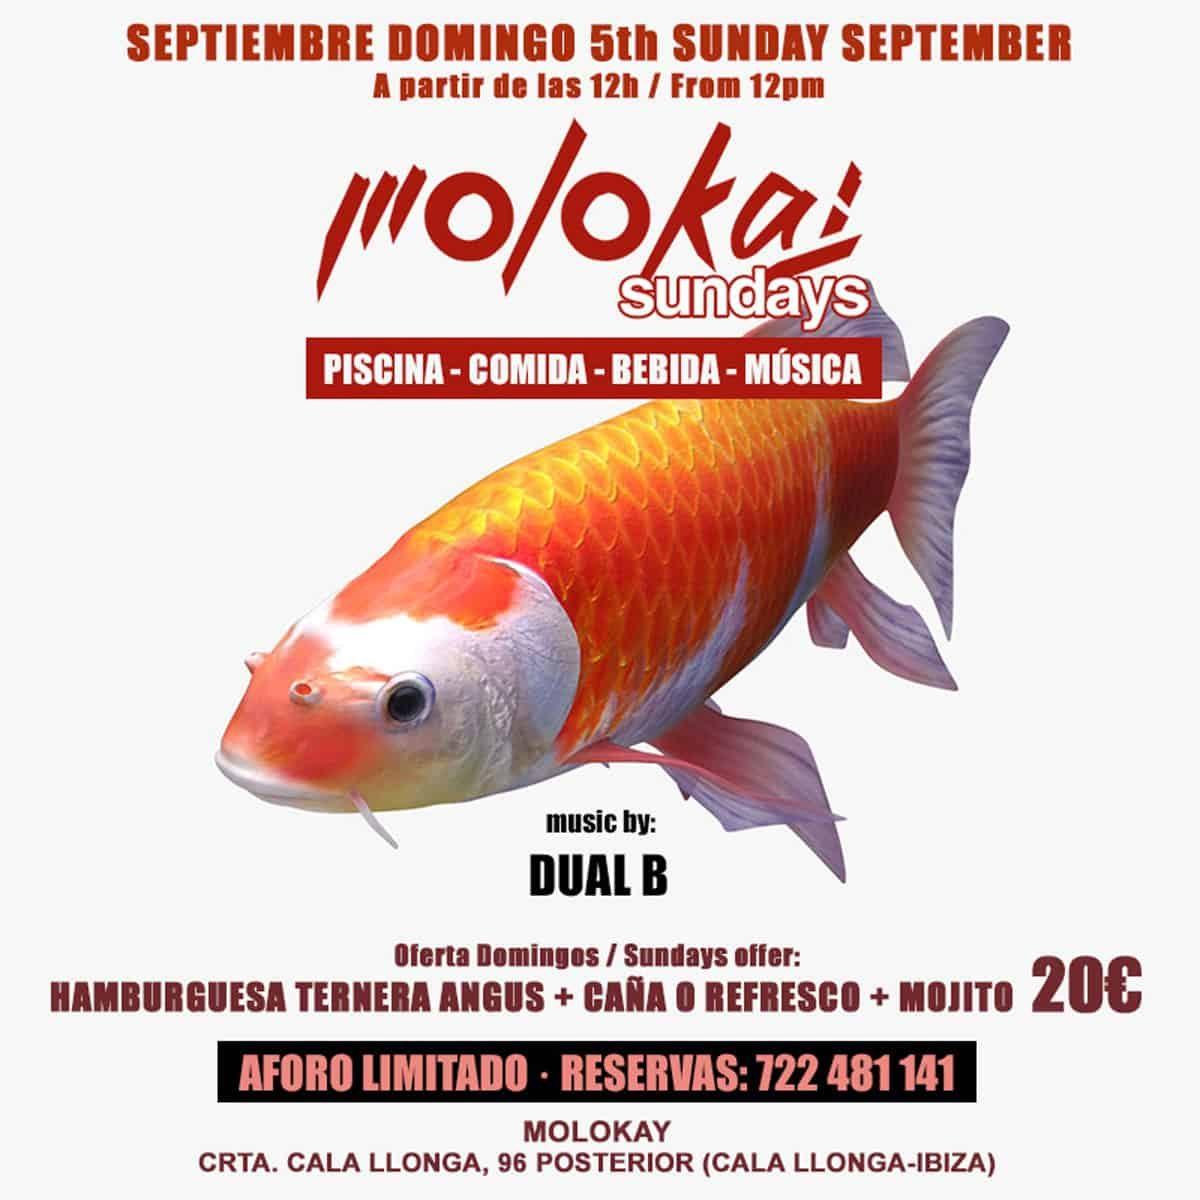 molokay-sundays-ibiza-2021-welcometoibiza